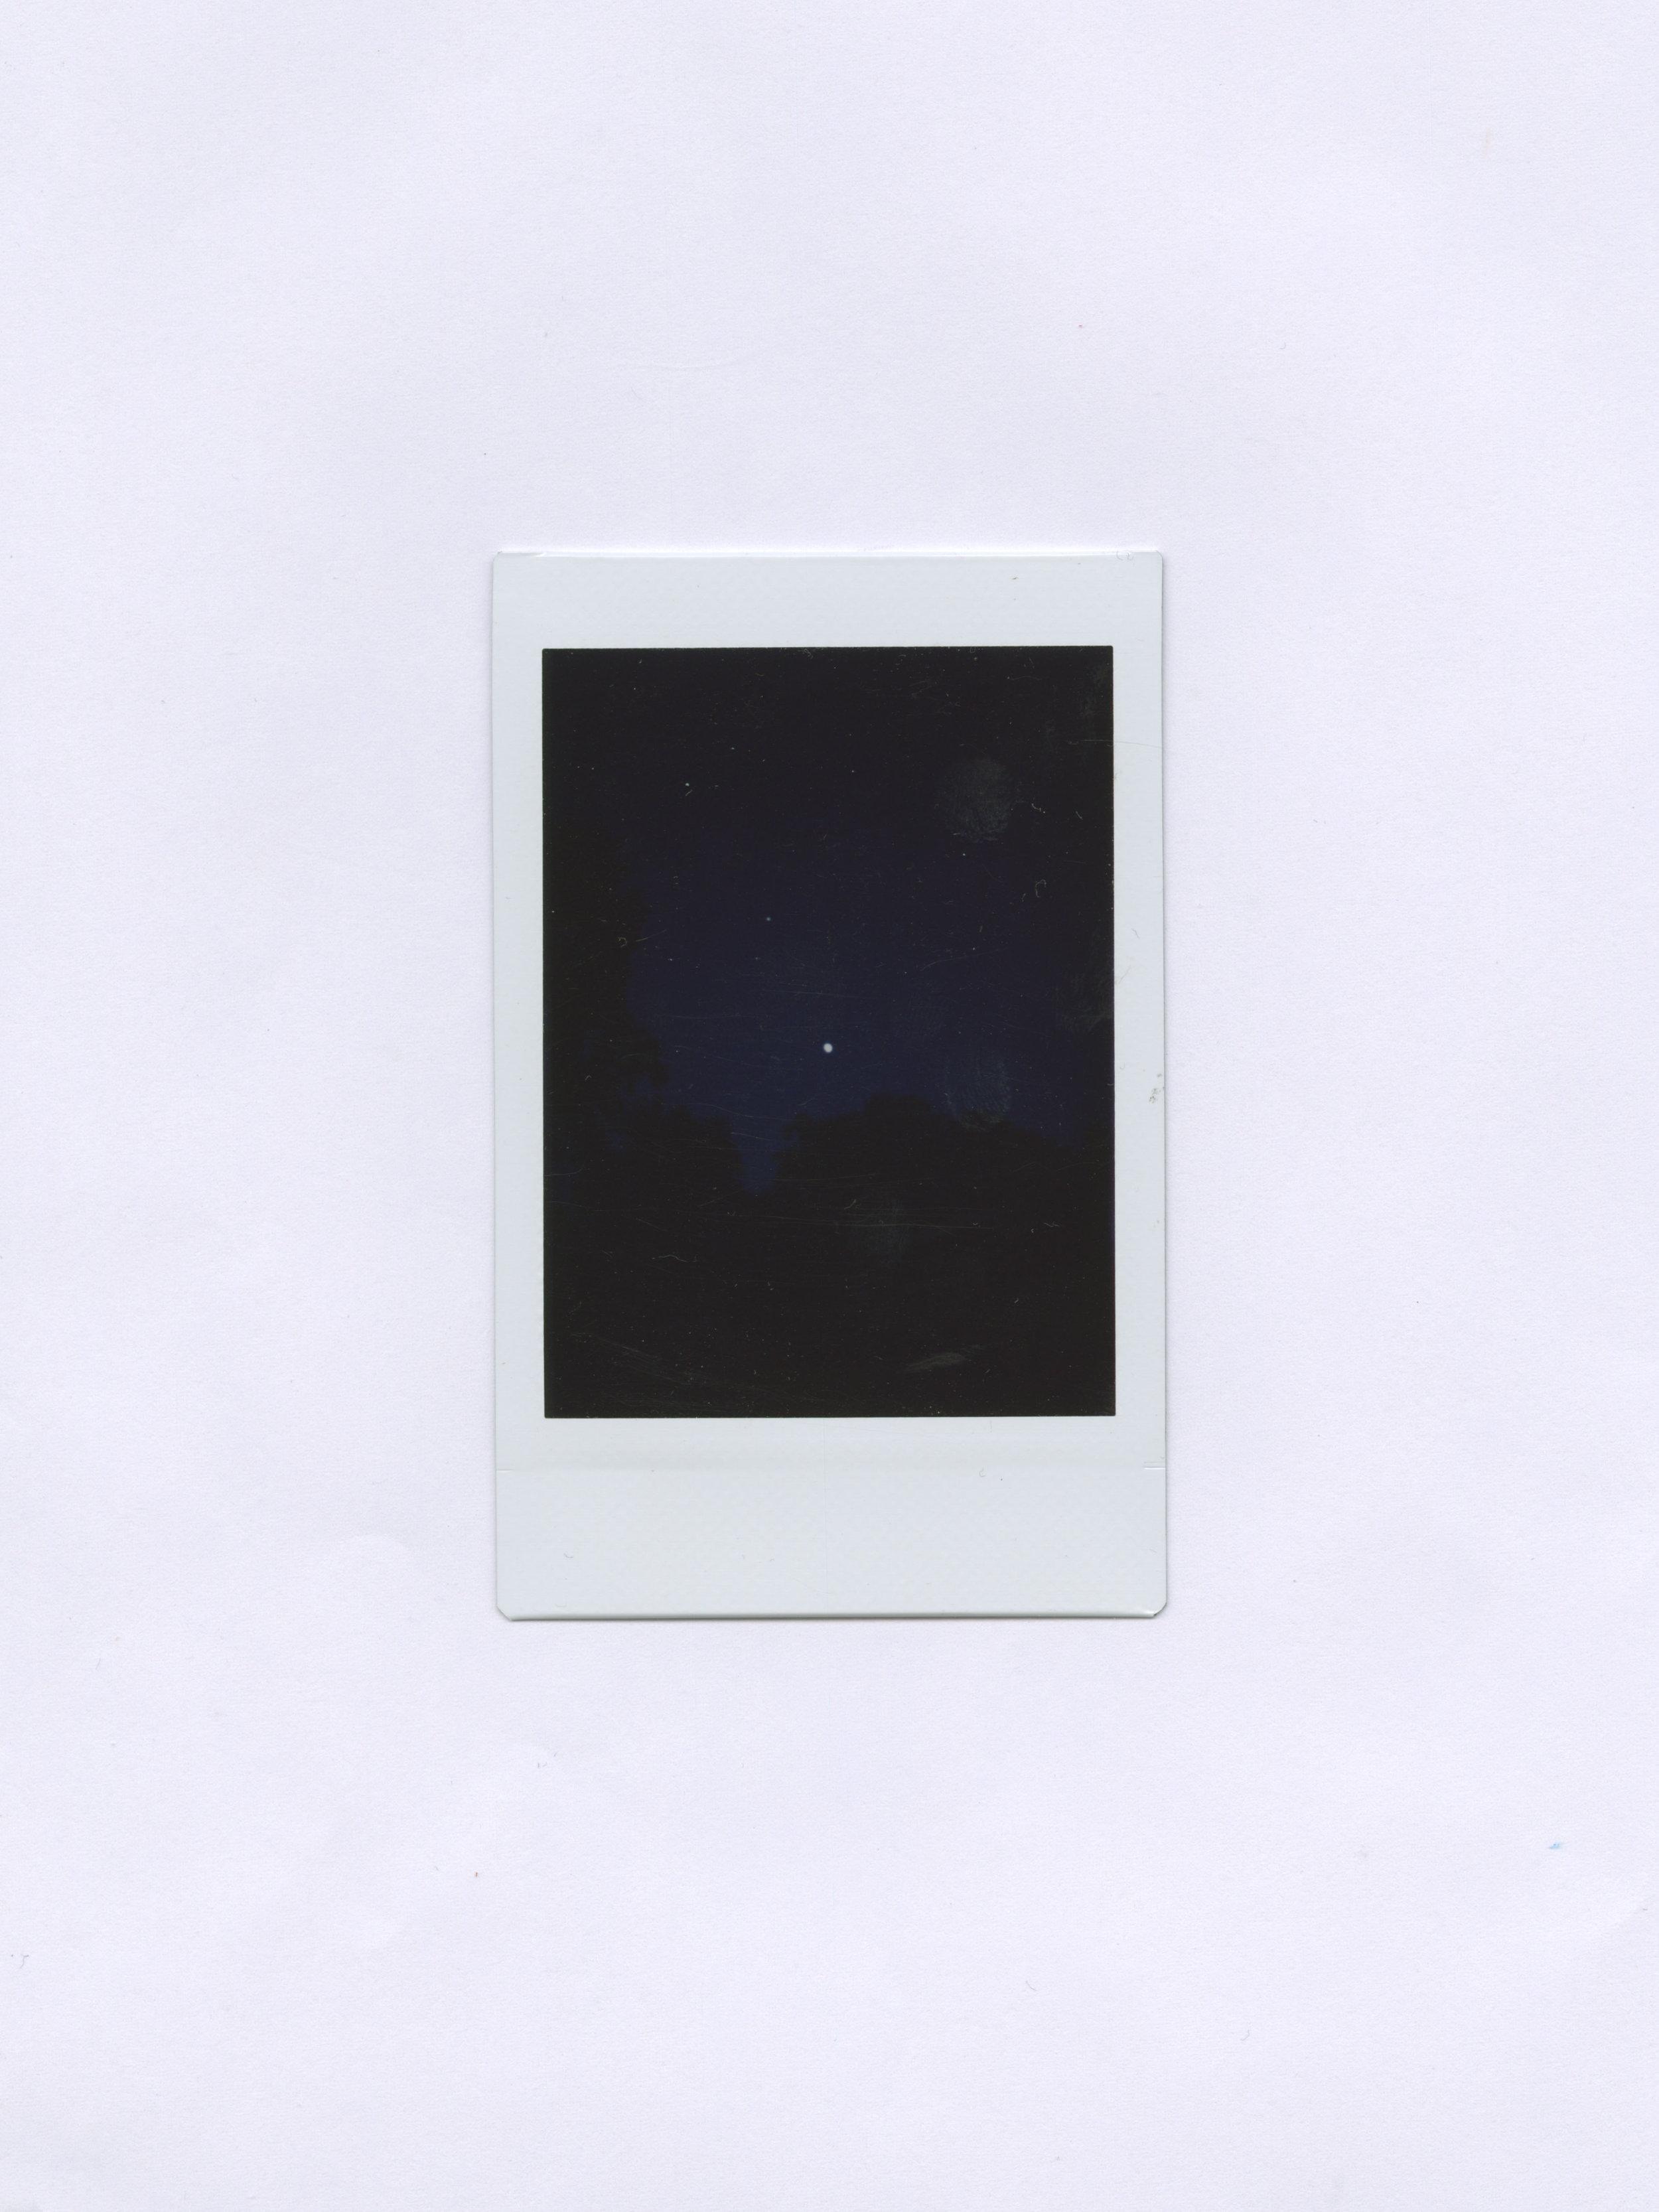 16.fdc216.jpg